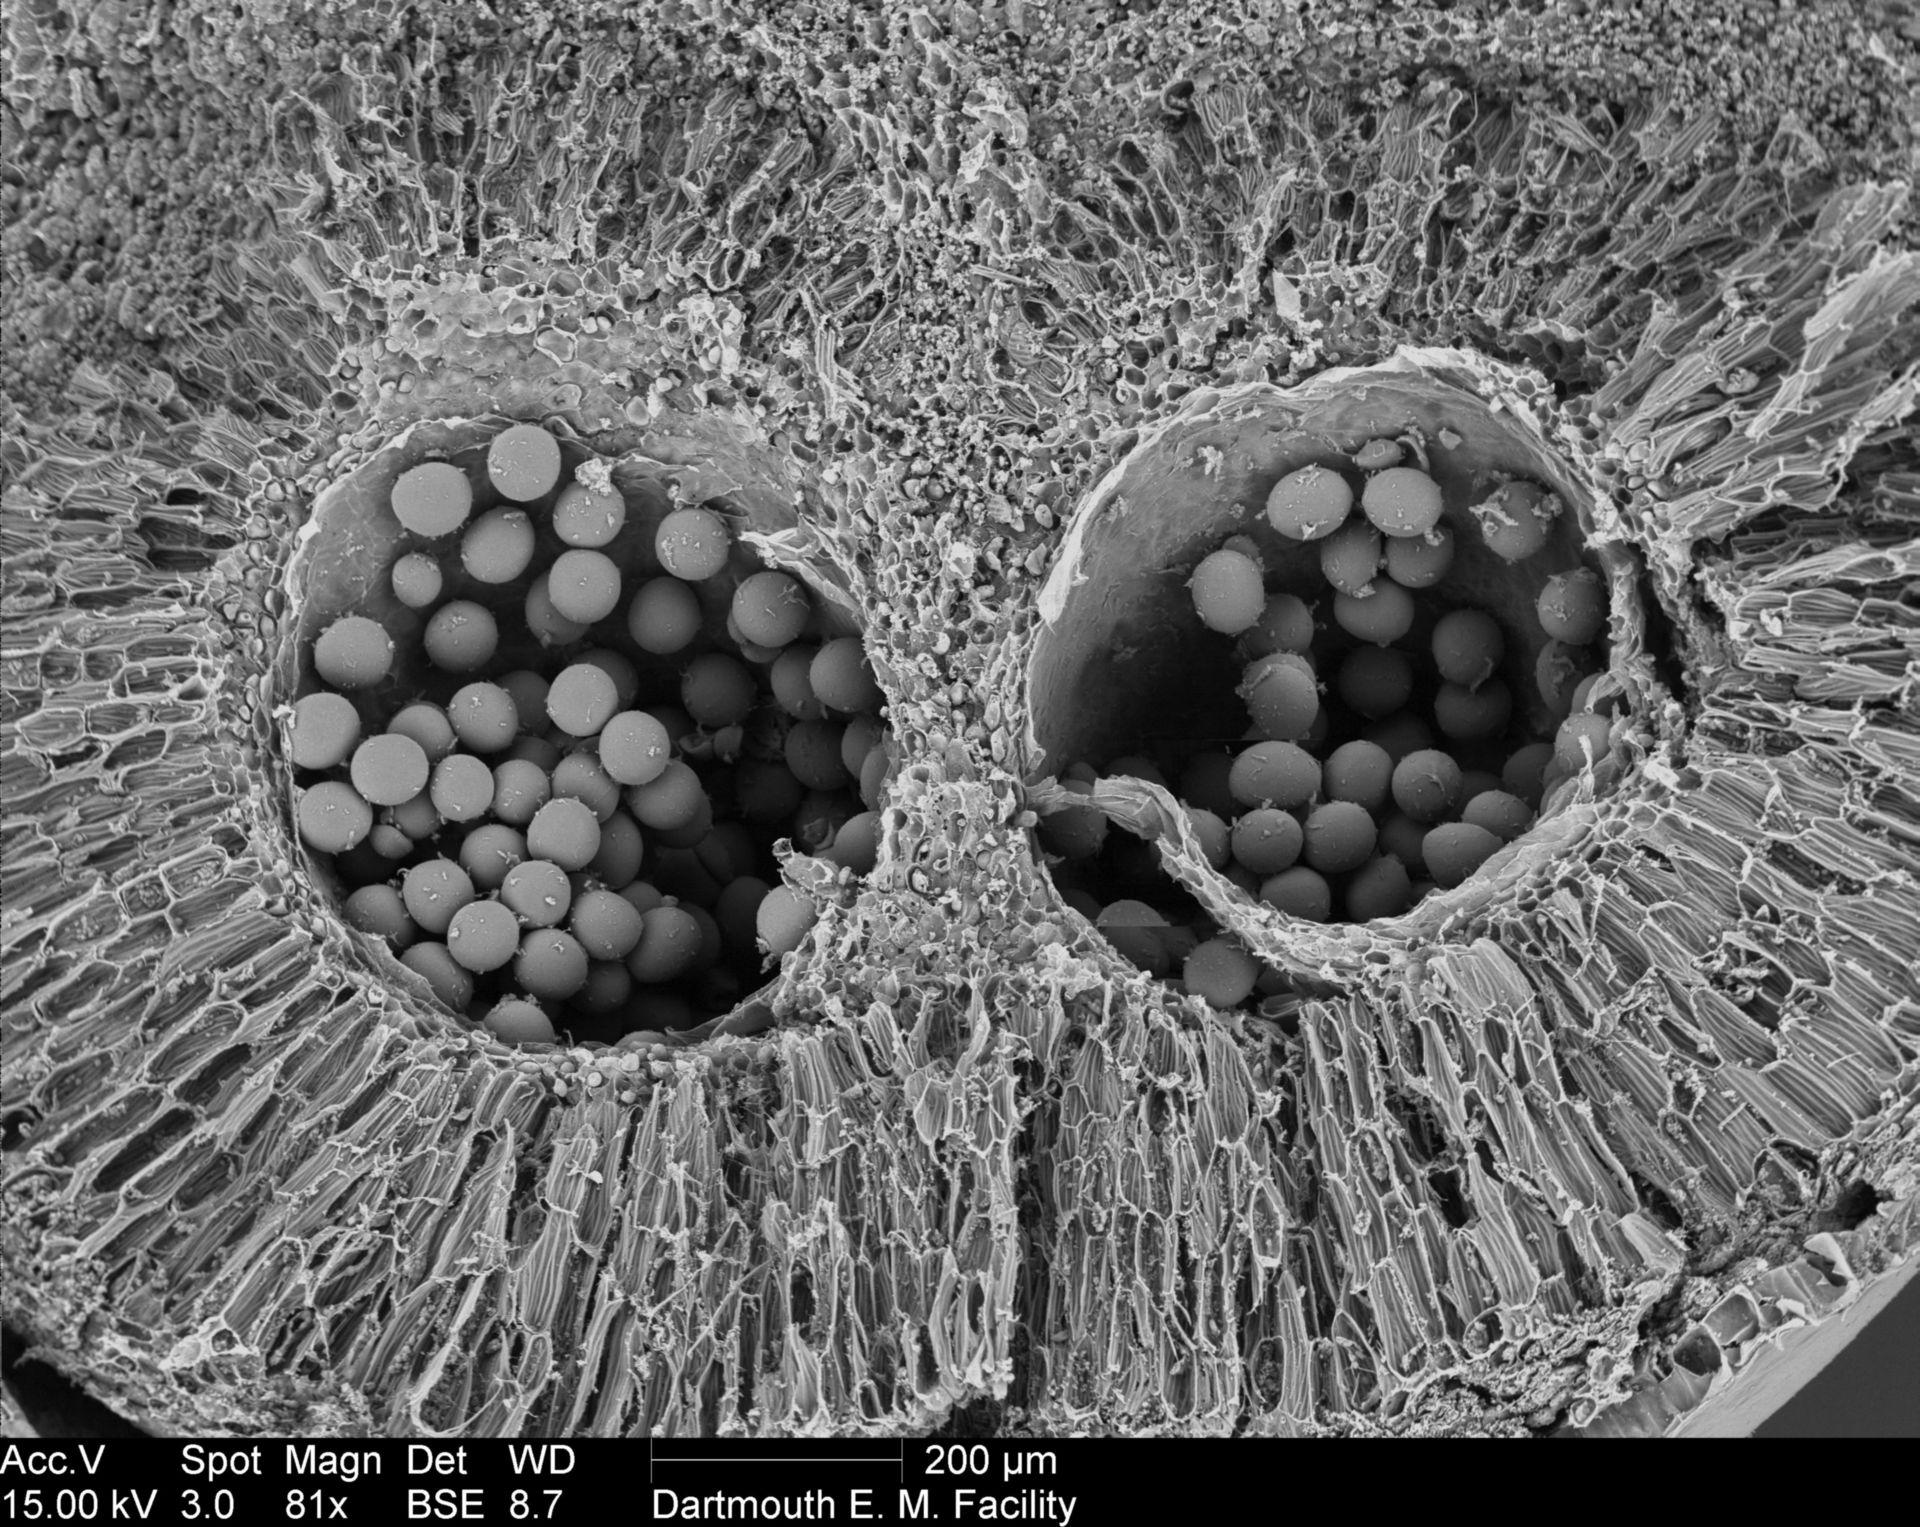 Amorphophallus titanum (superfici polline) - CIL:39378